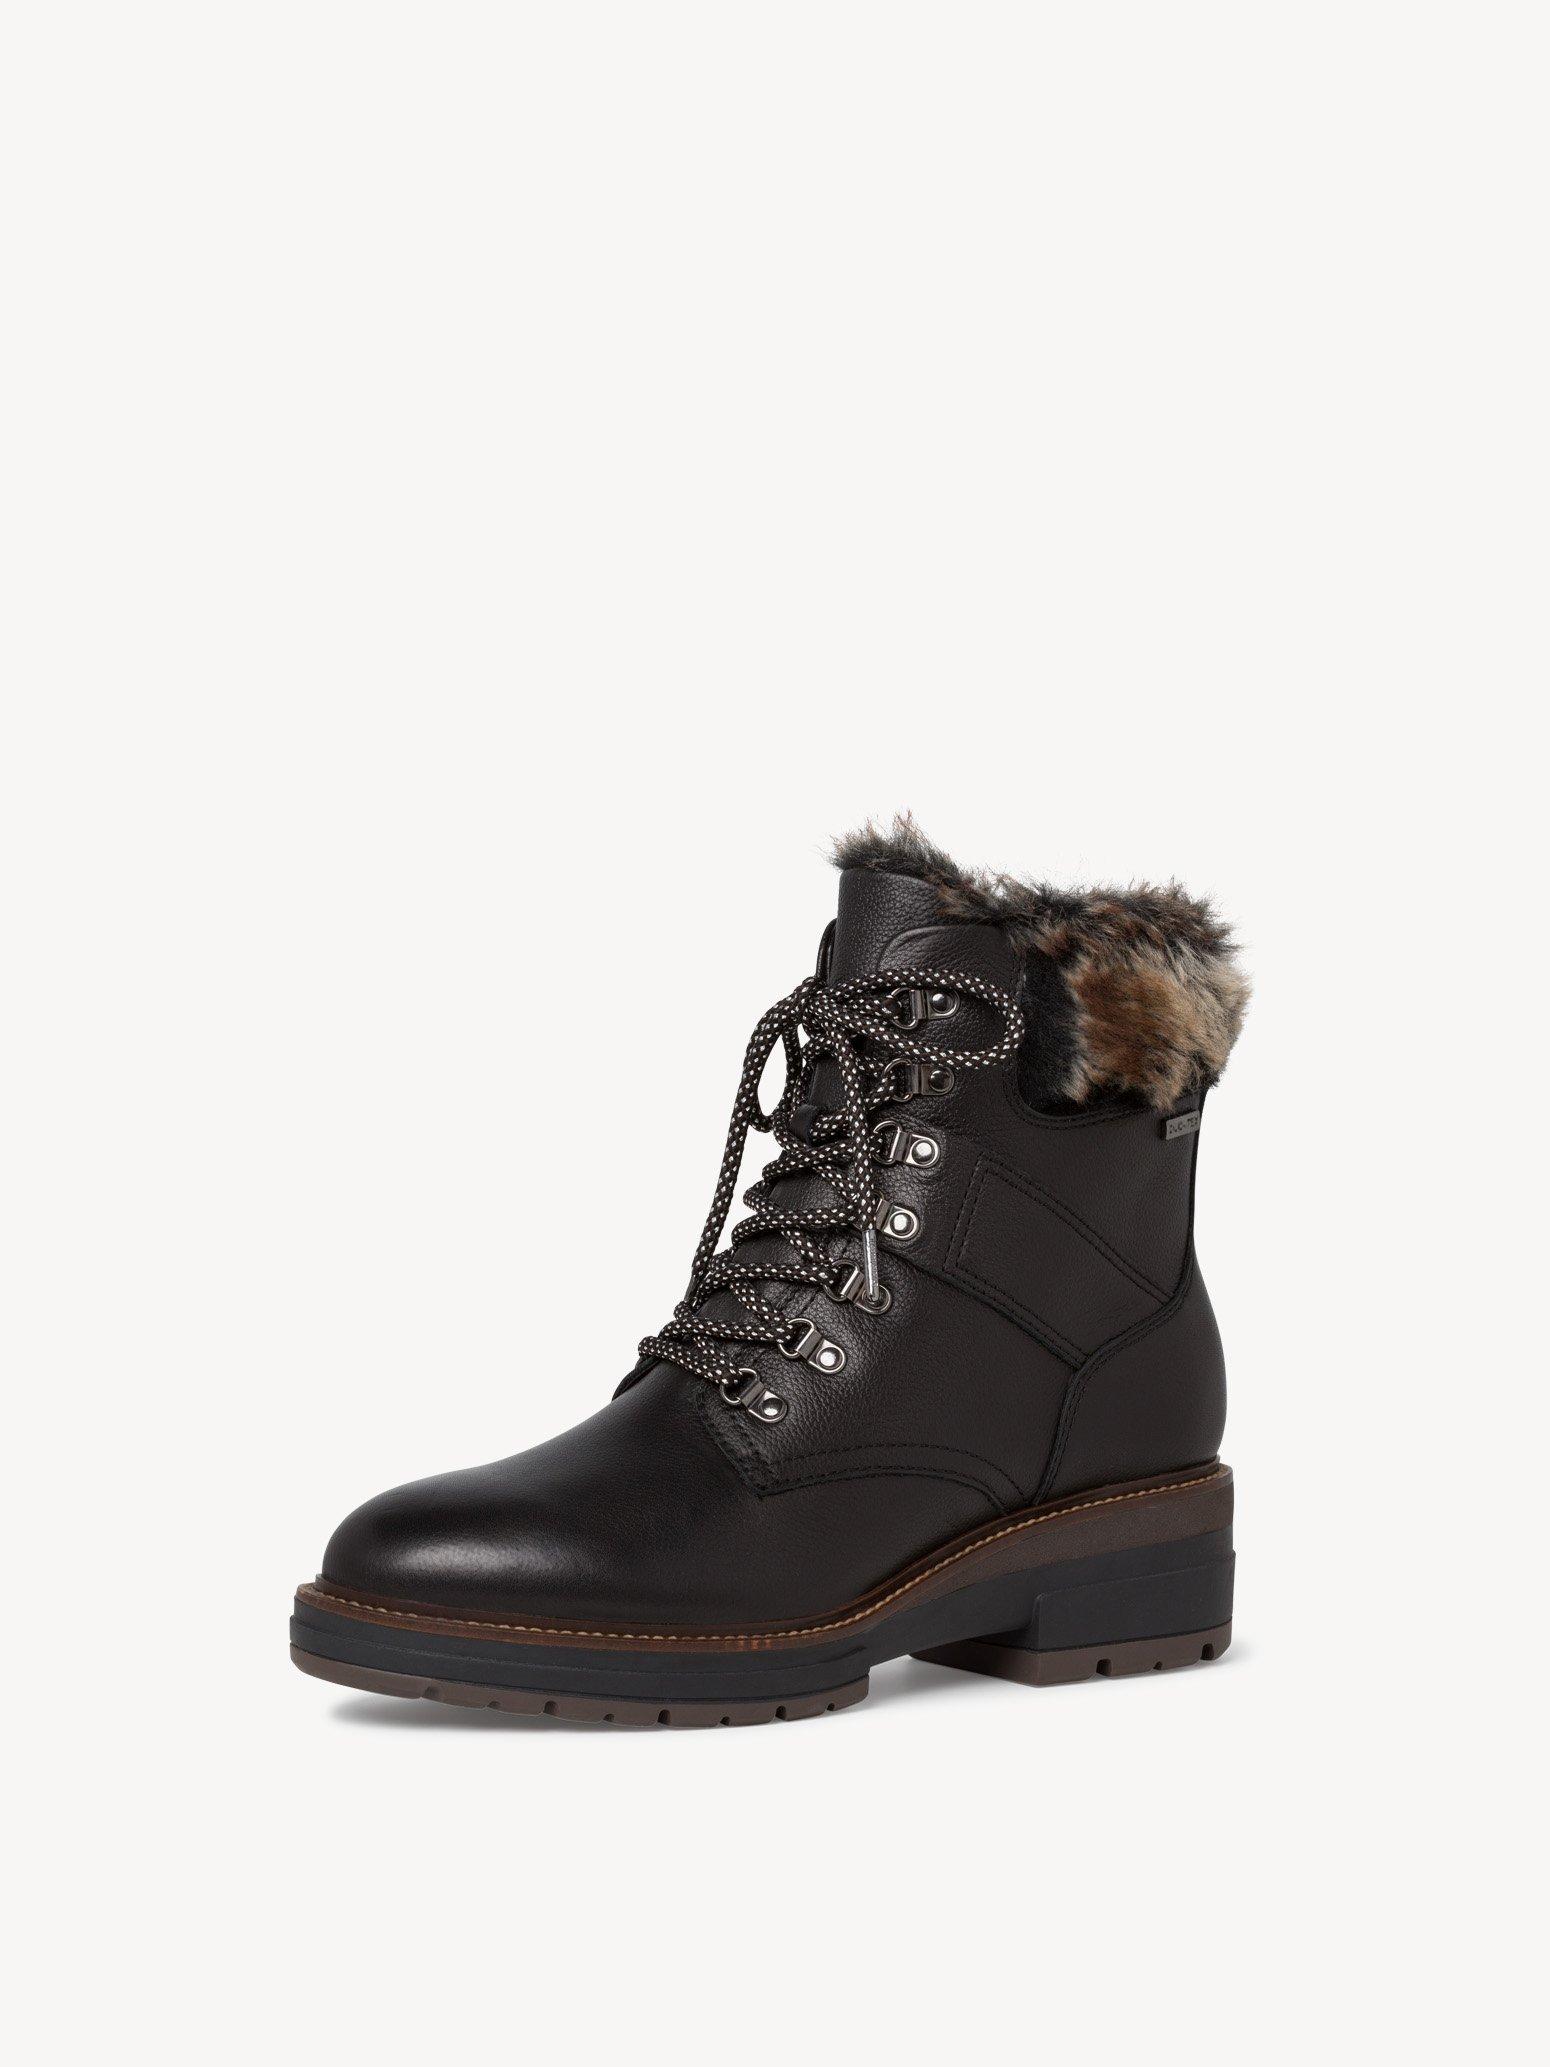 Ботинки Tamaris 1-1-26259-25-003